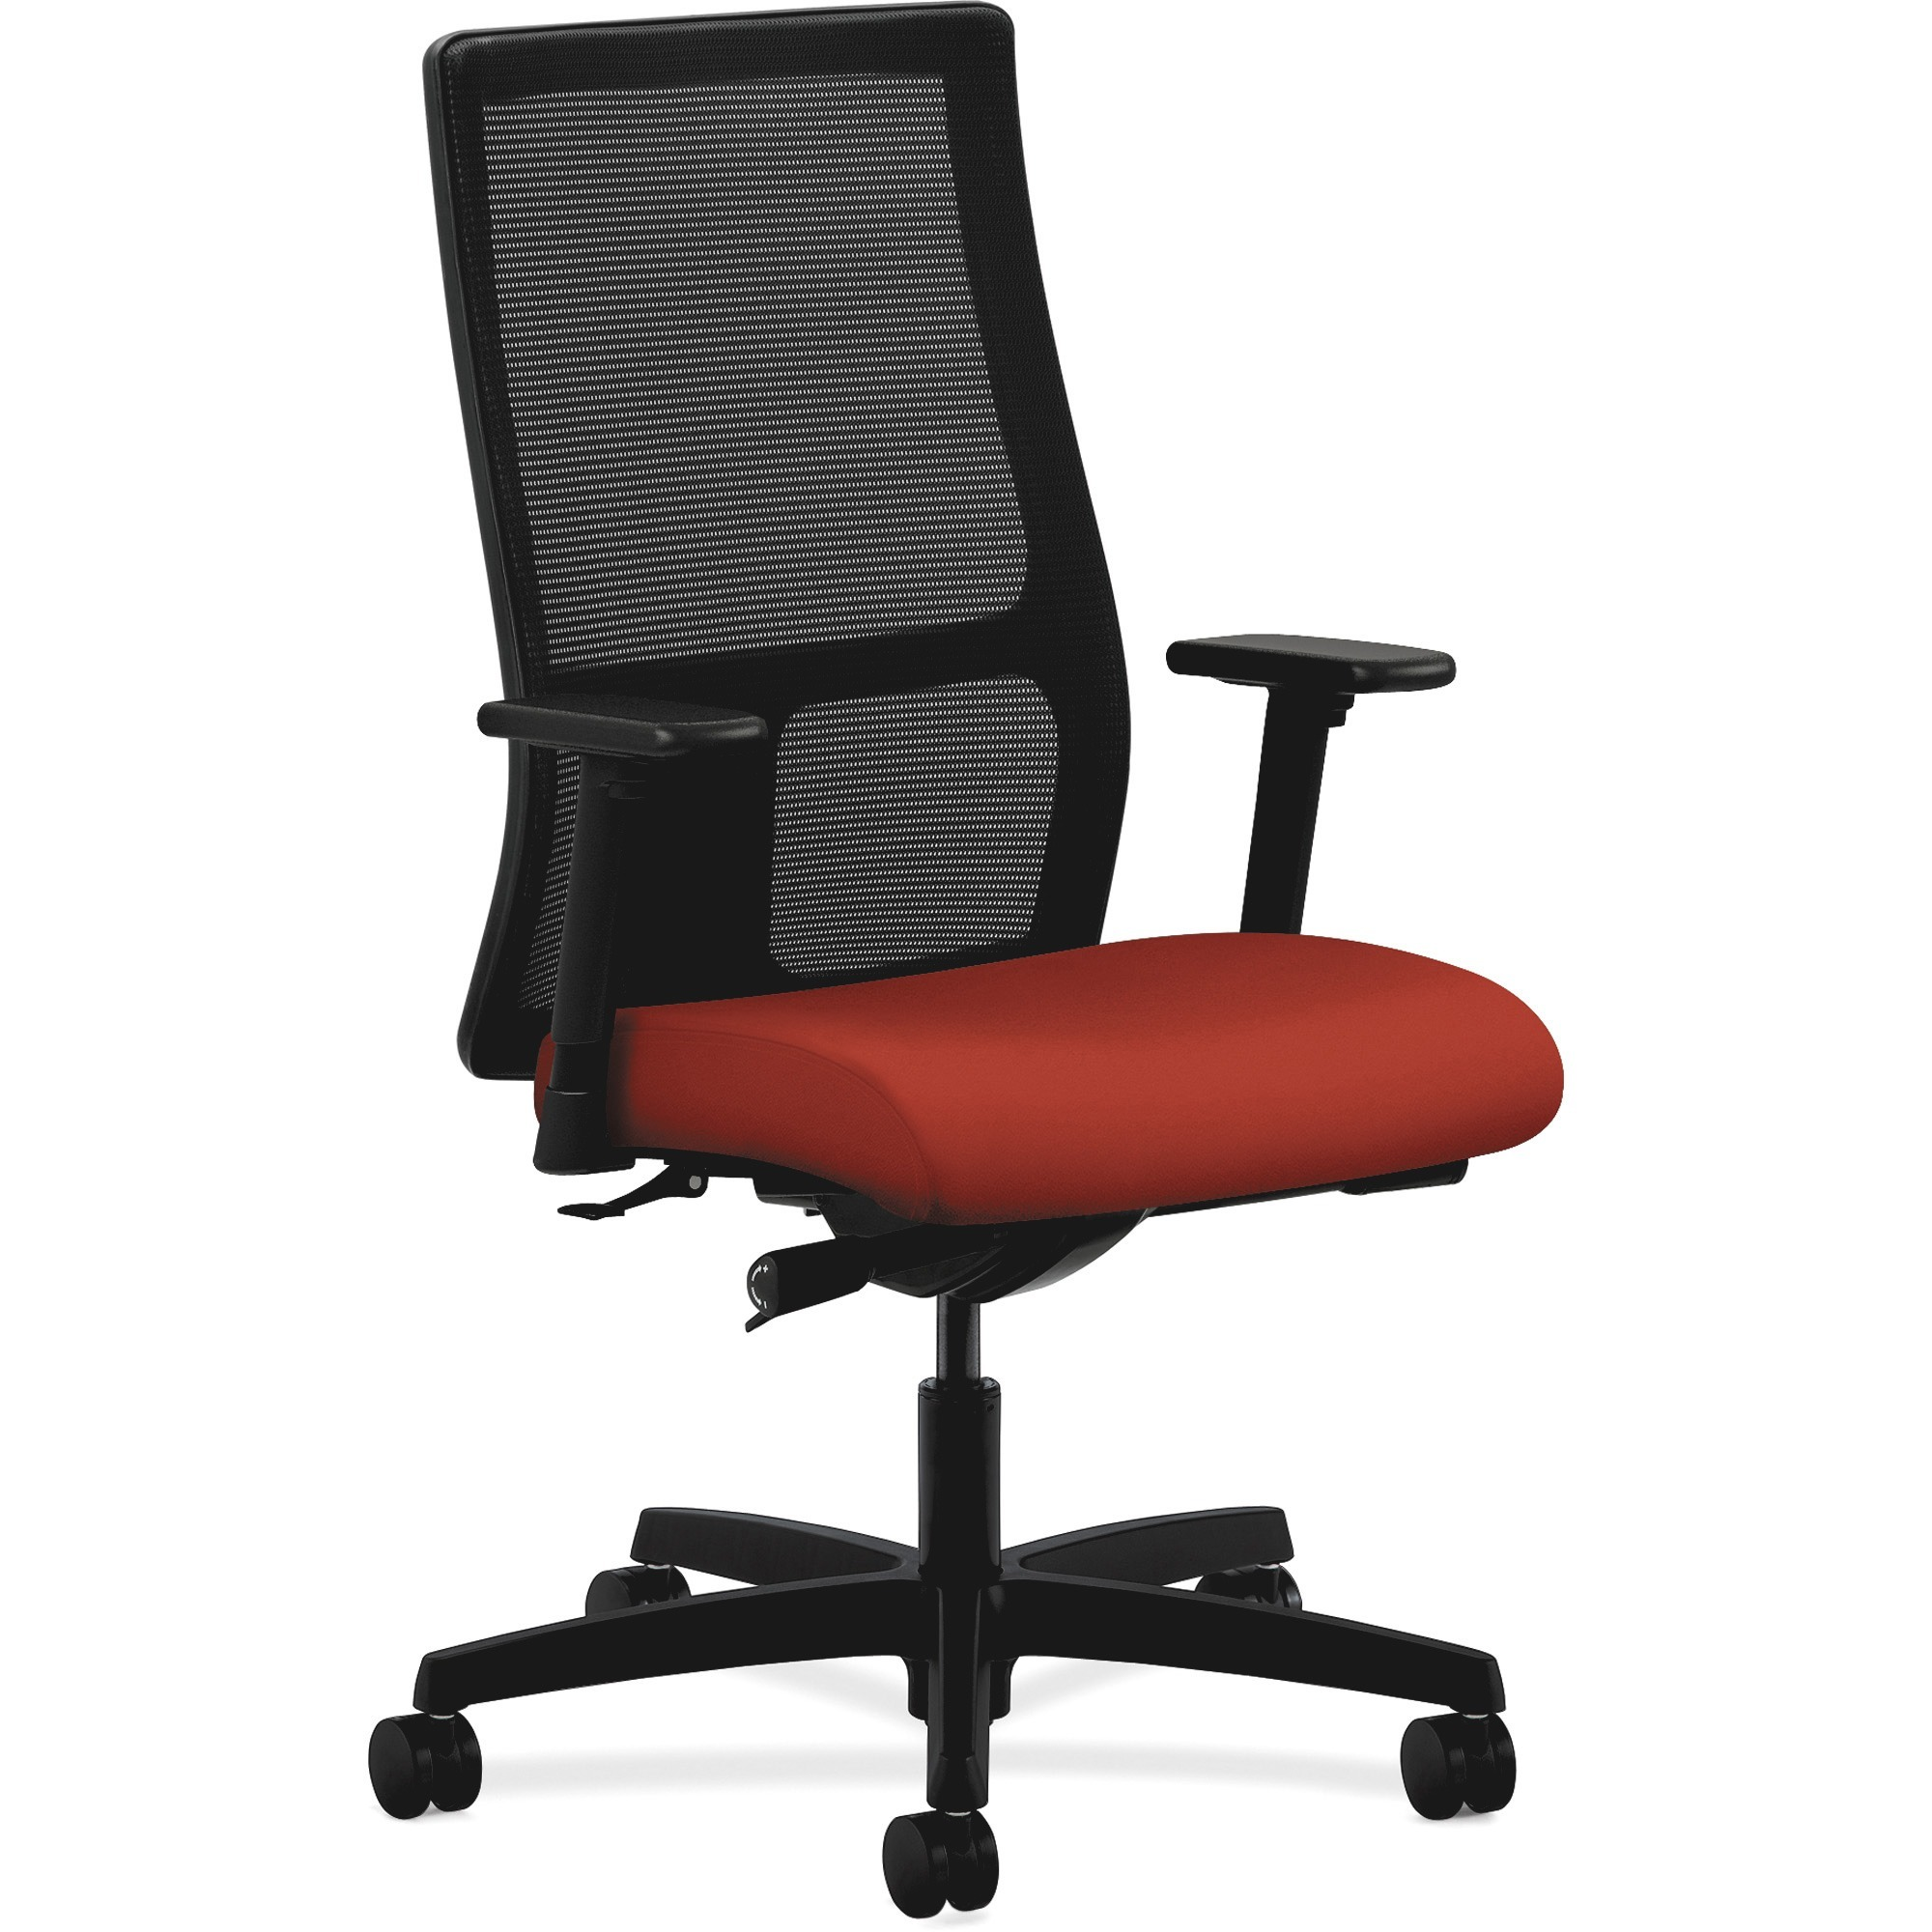 HON, HONIW103CU42, Ignition Mid-Back Task Chair, Arms, 1 Each, Black,Poppy